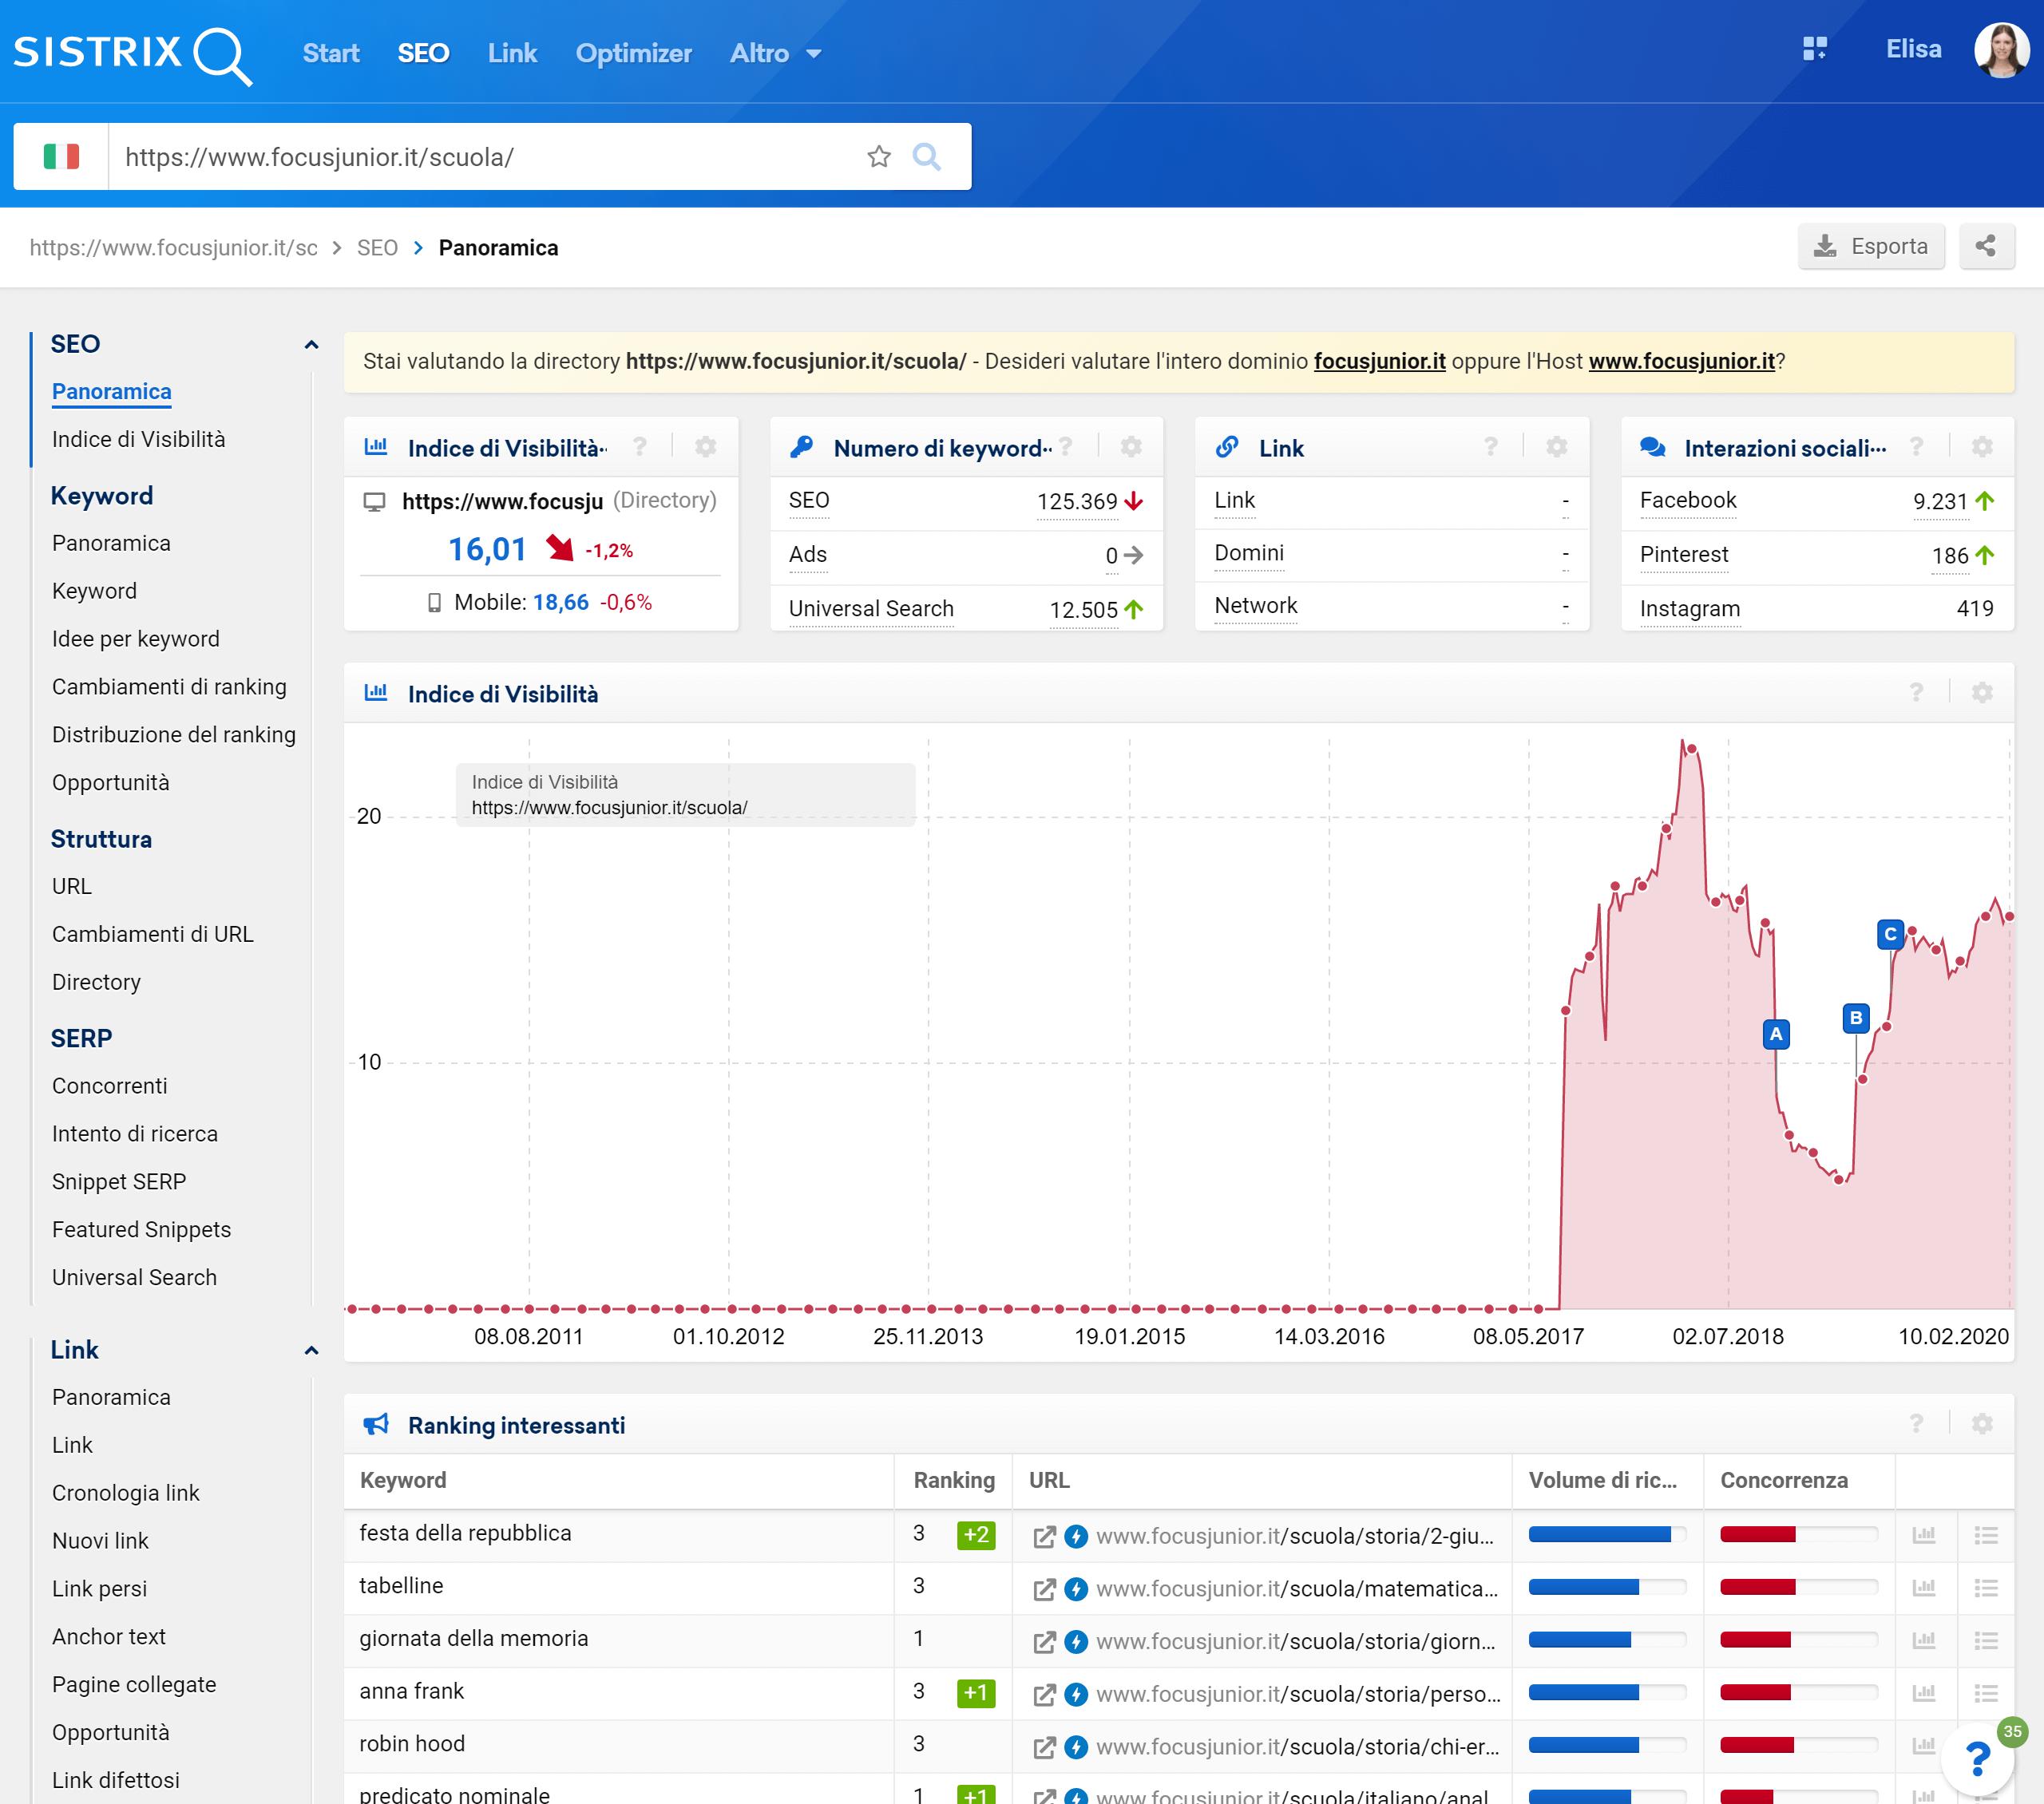 Analisi di una directory nel Toolbox SISTRIX